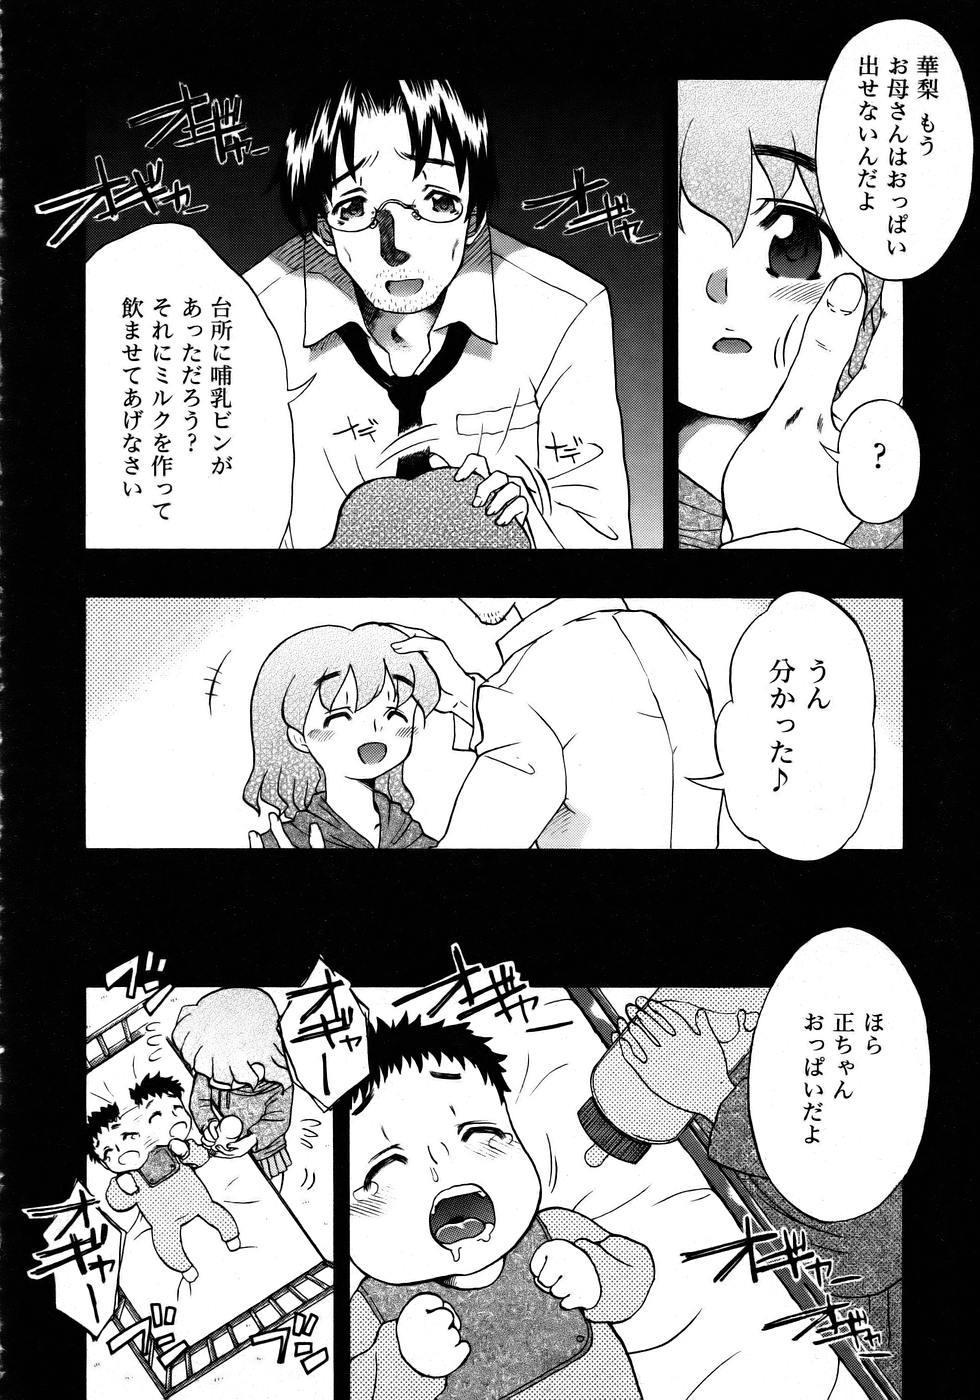 COMIC AUN 2005-12 Vol. 115 381